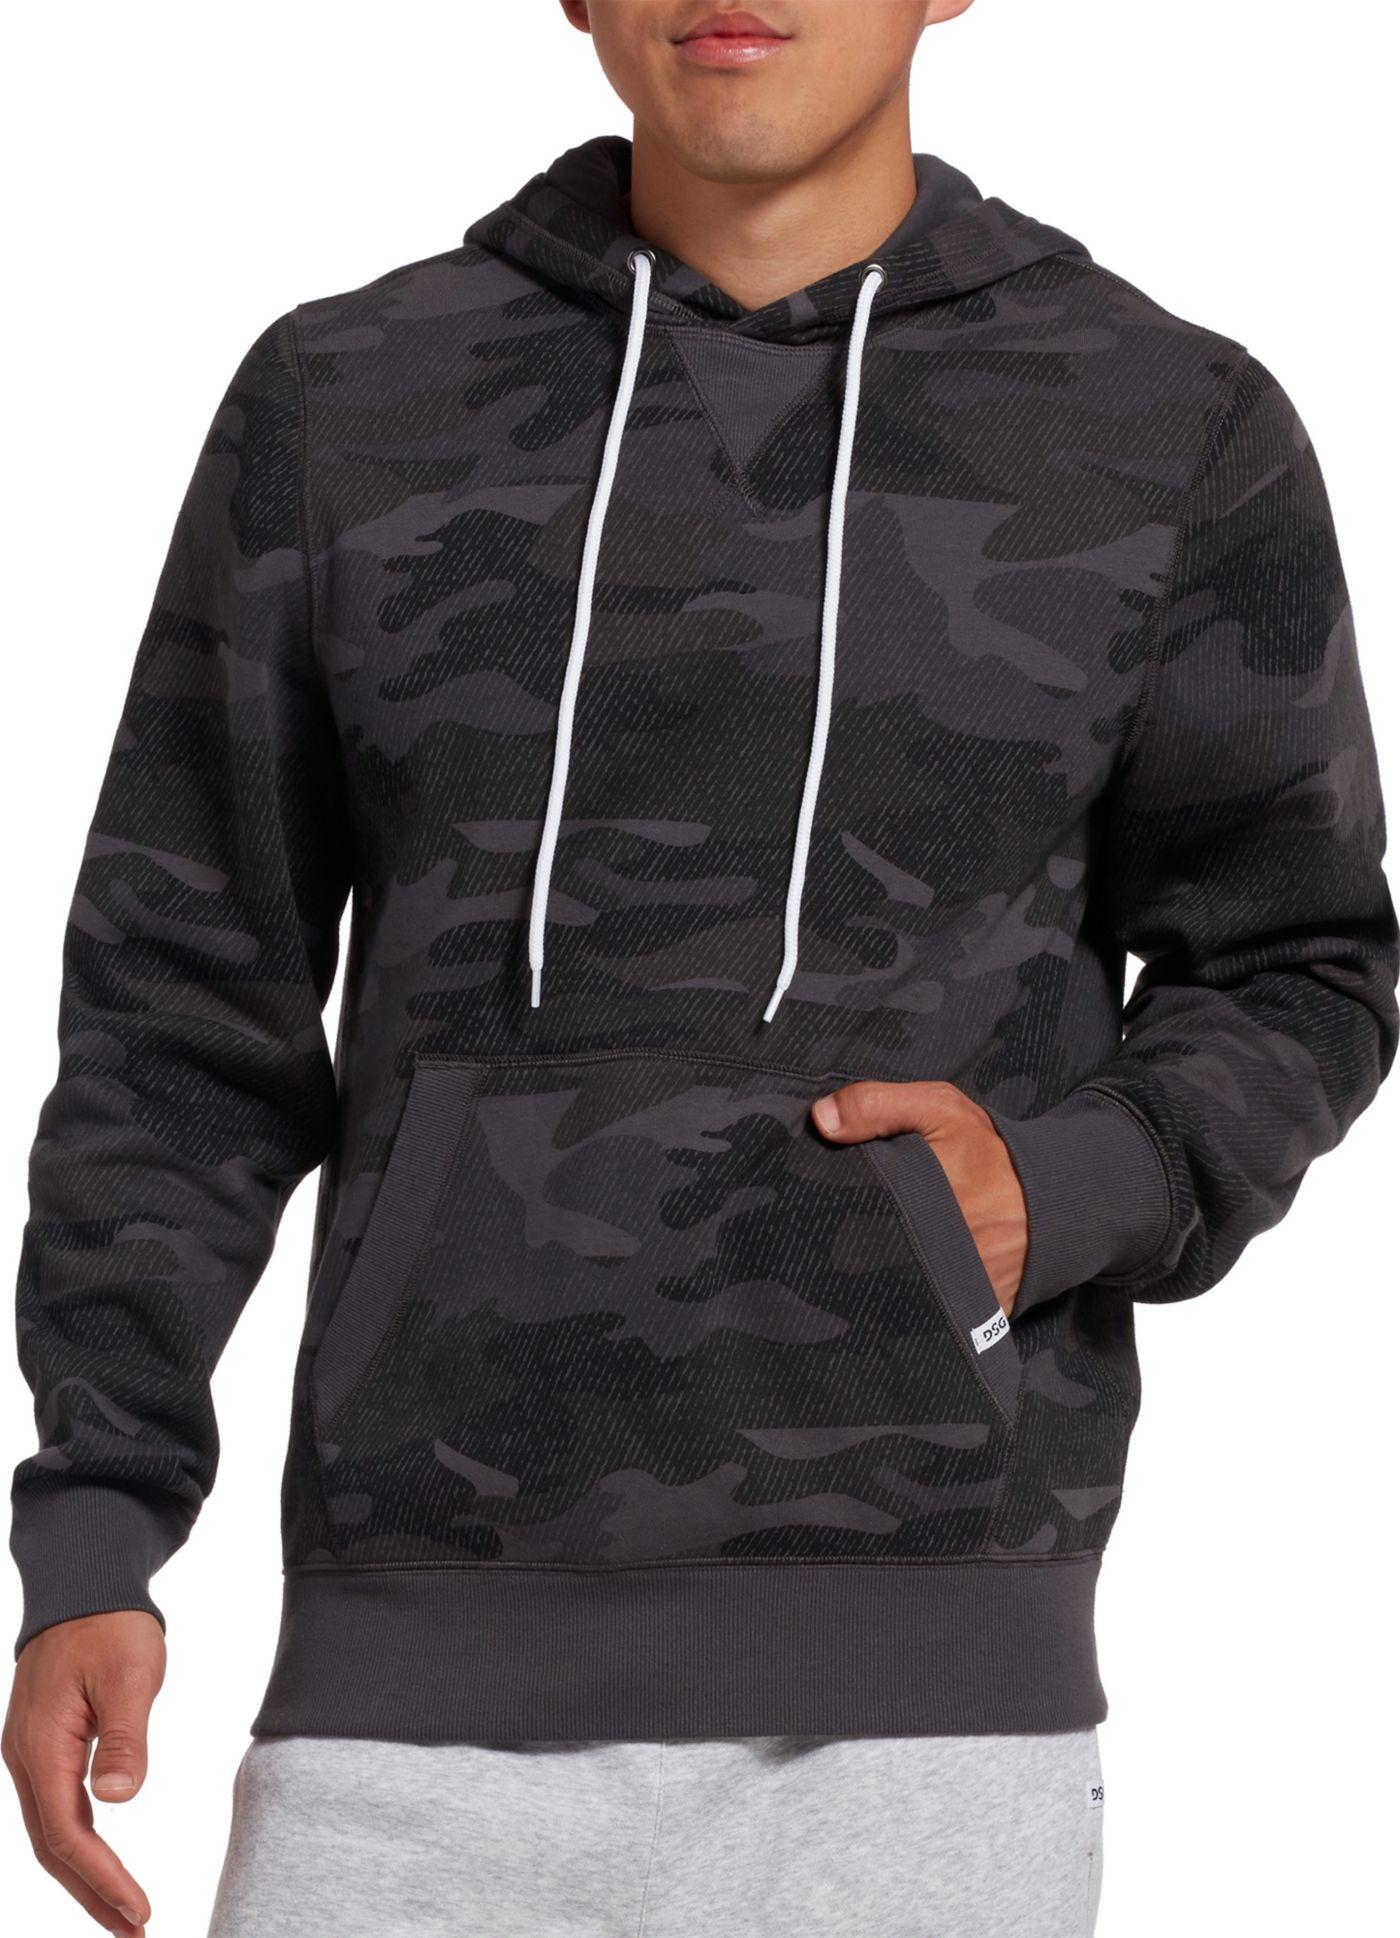 DSG Men's Everyday Cotton Fleece Hoodie (Regular and Big & Tall)